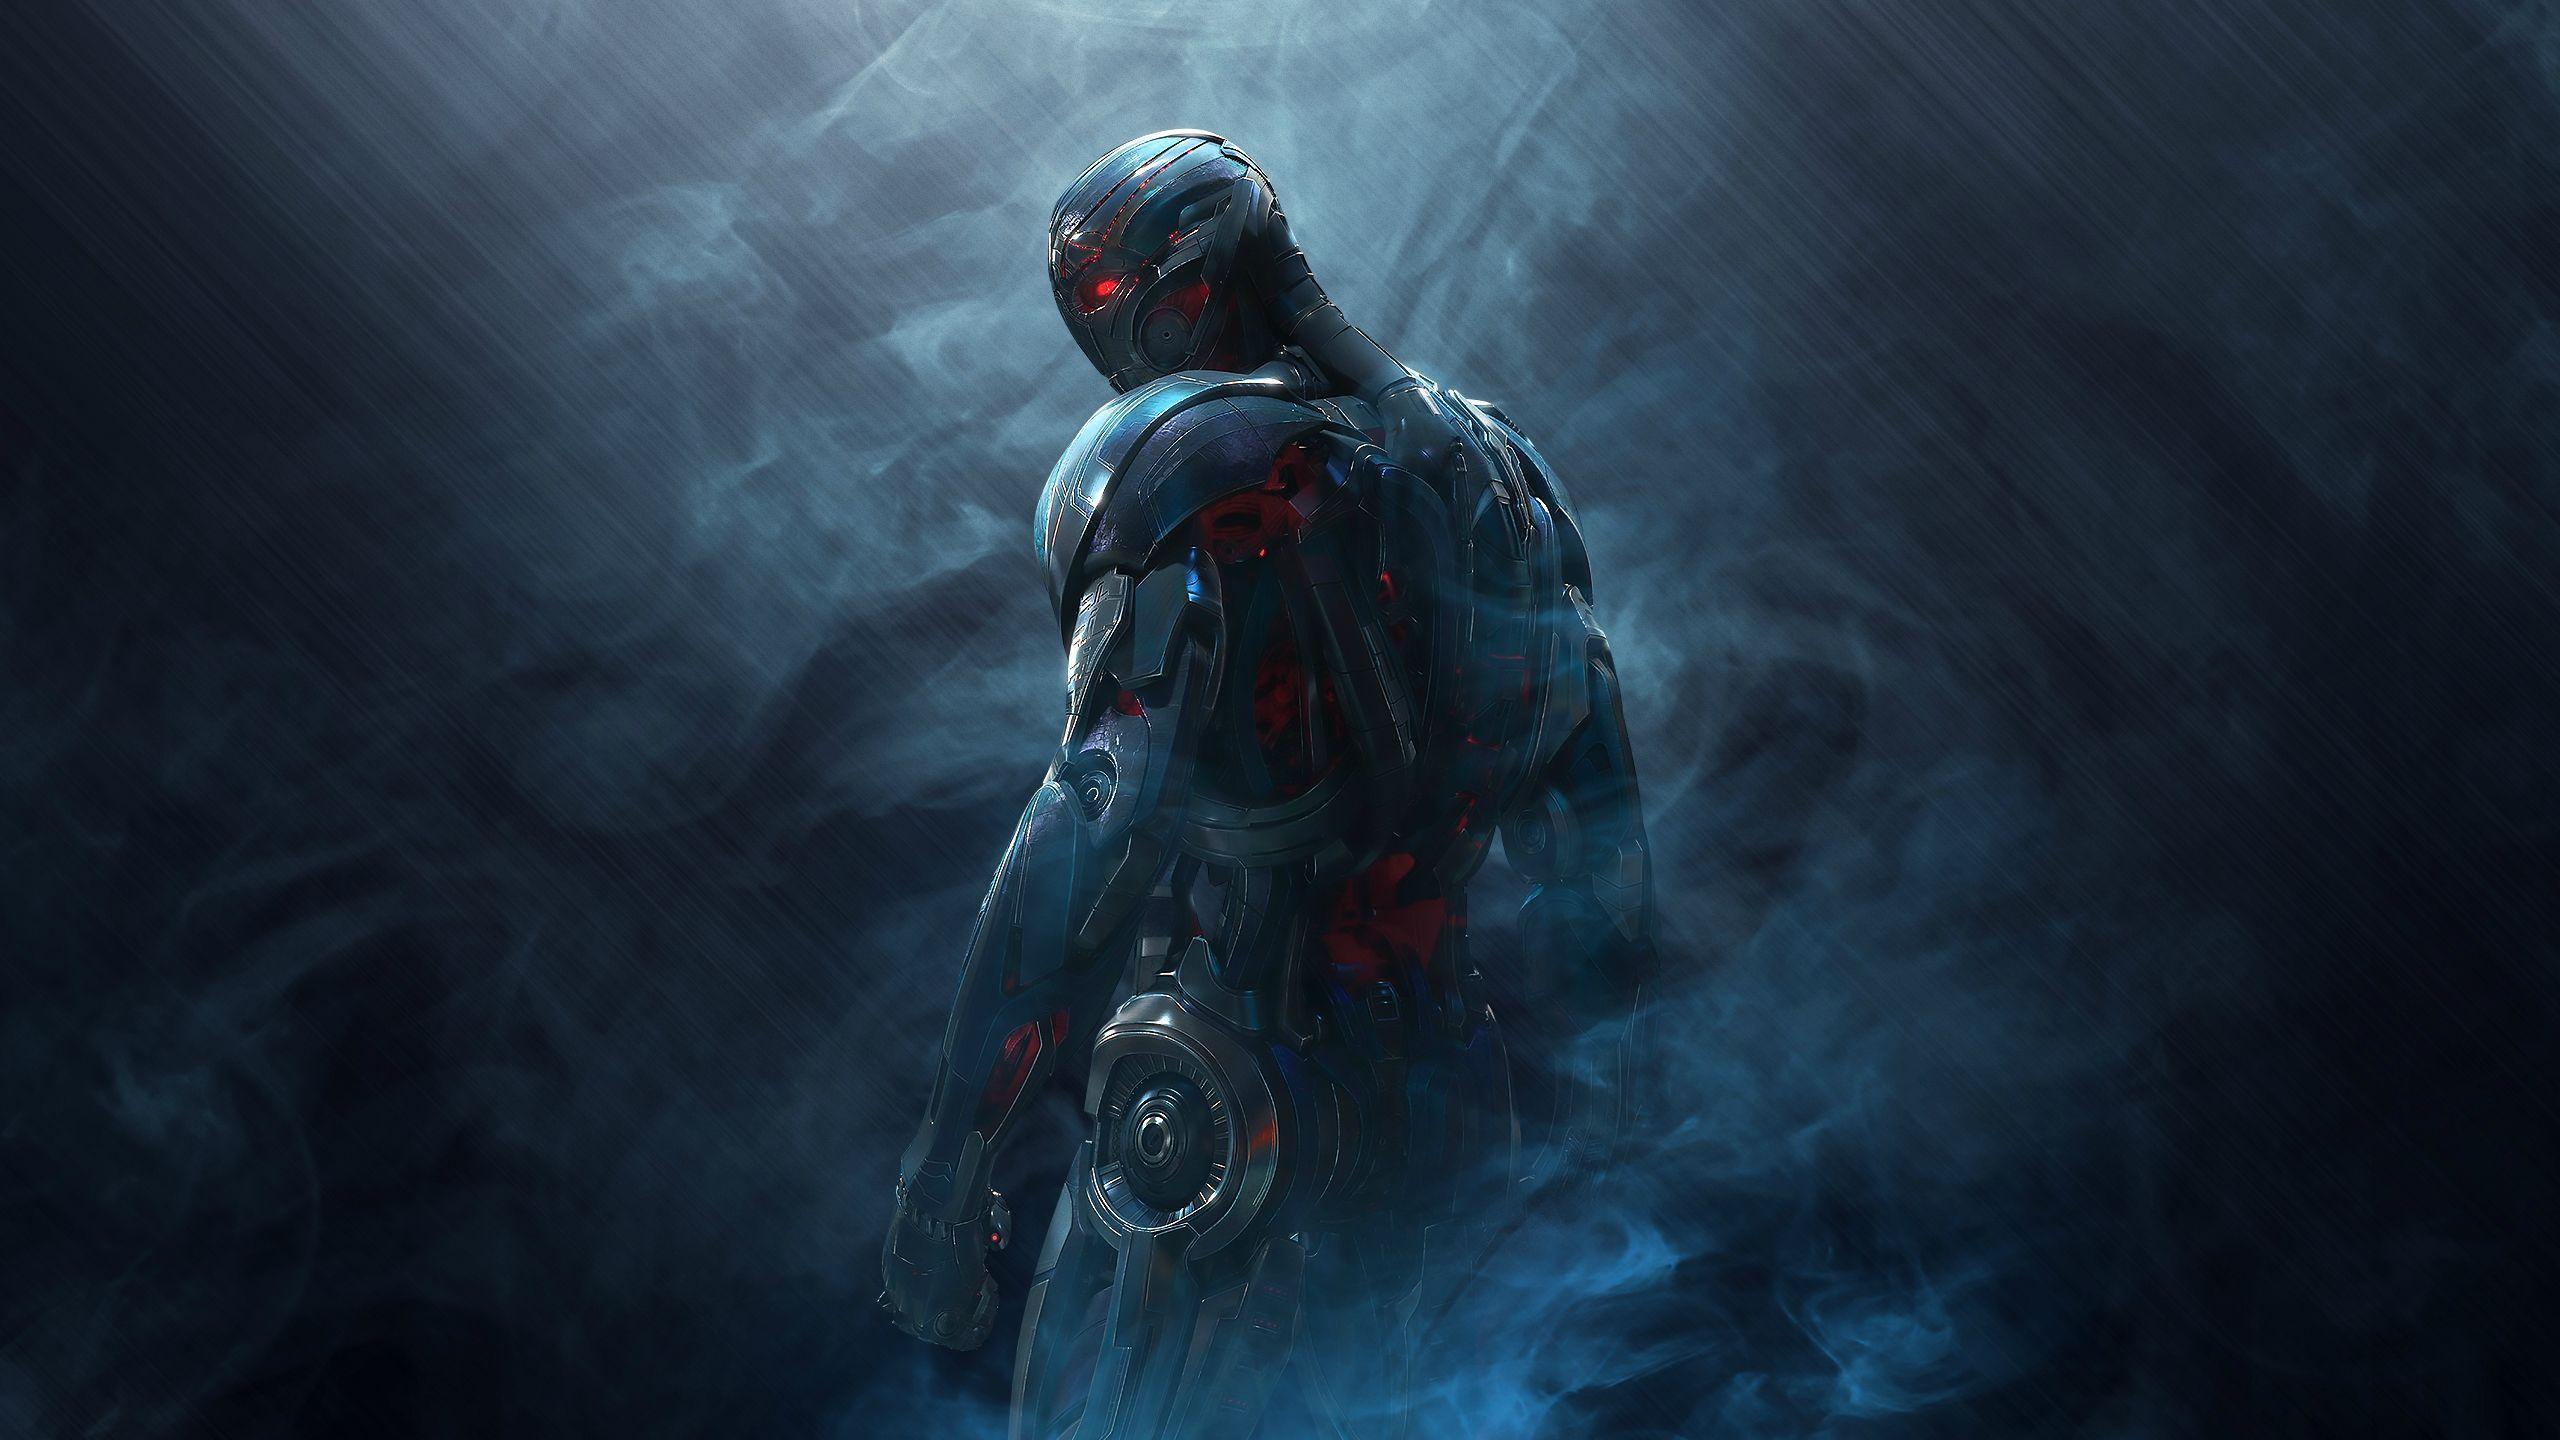 1080p Avengers Laptop Wallpaper Background Images